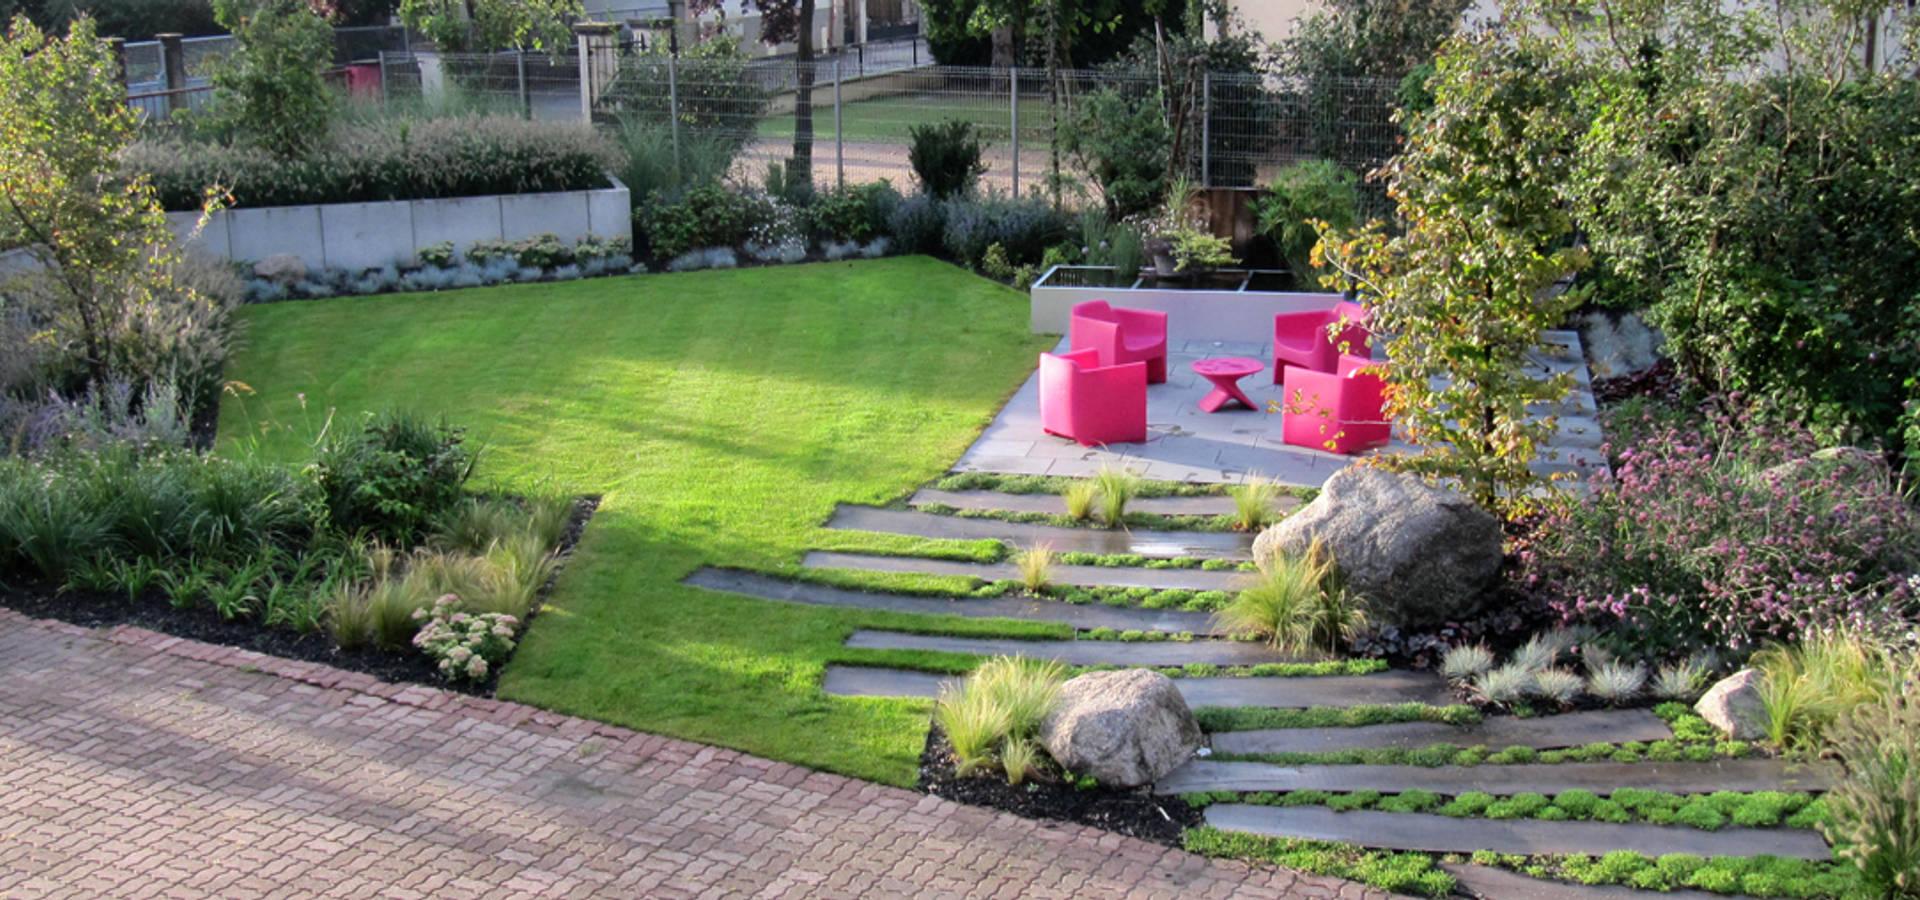 Jardin de particulier de schaedele paysagiste homify for Jardin paysagiste photo